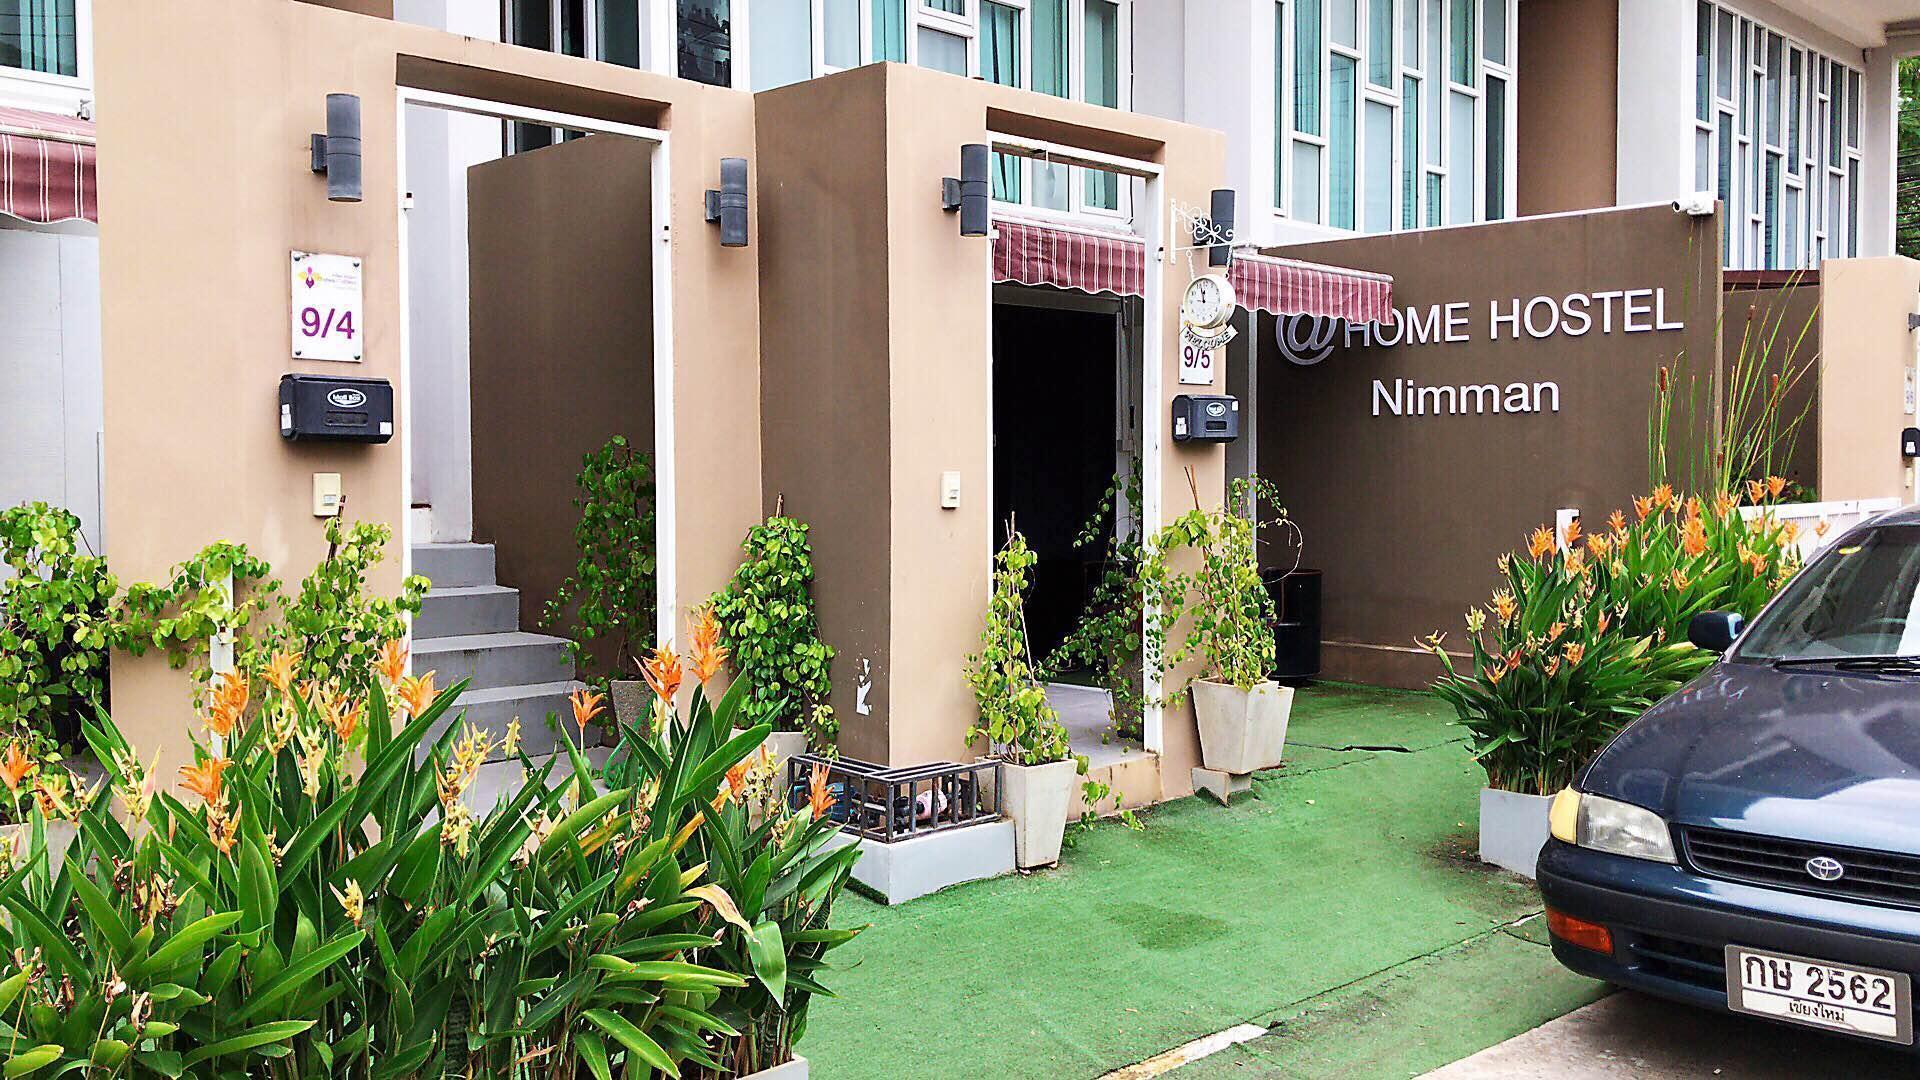 @home hostel Nimman บ้านเดี่ยว 1 ห้องนอน 1 ห้องน้ำส่วนตัว ขนาด 18 ตร.ม. – นิมมานเหมินทร์